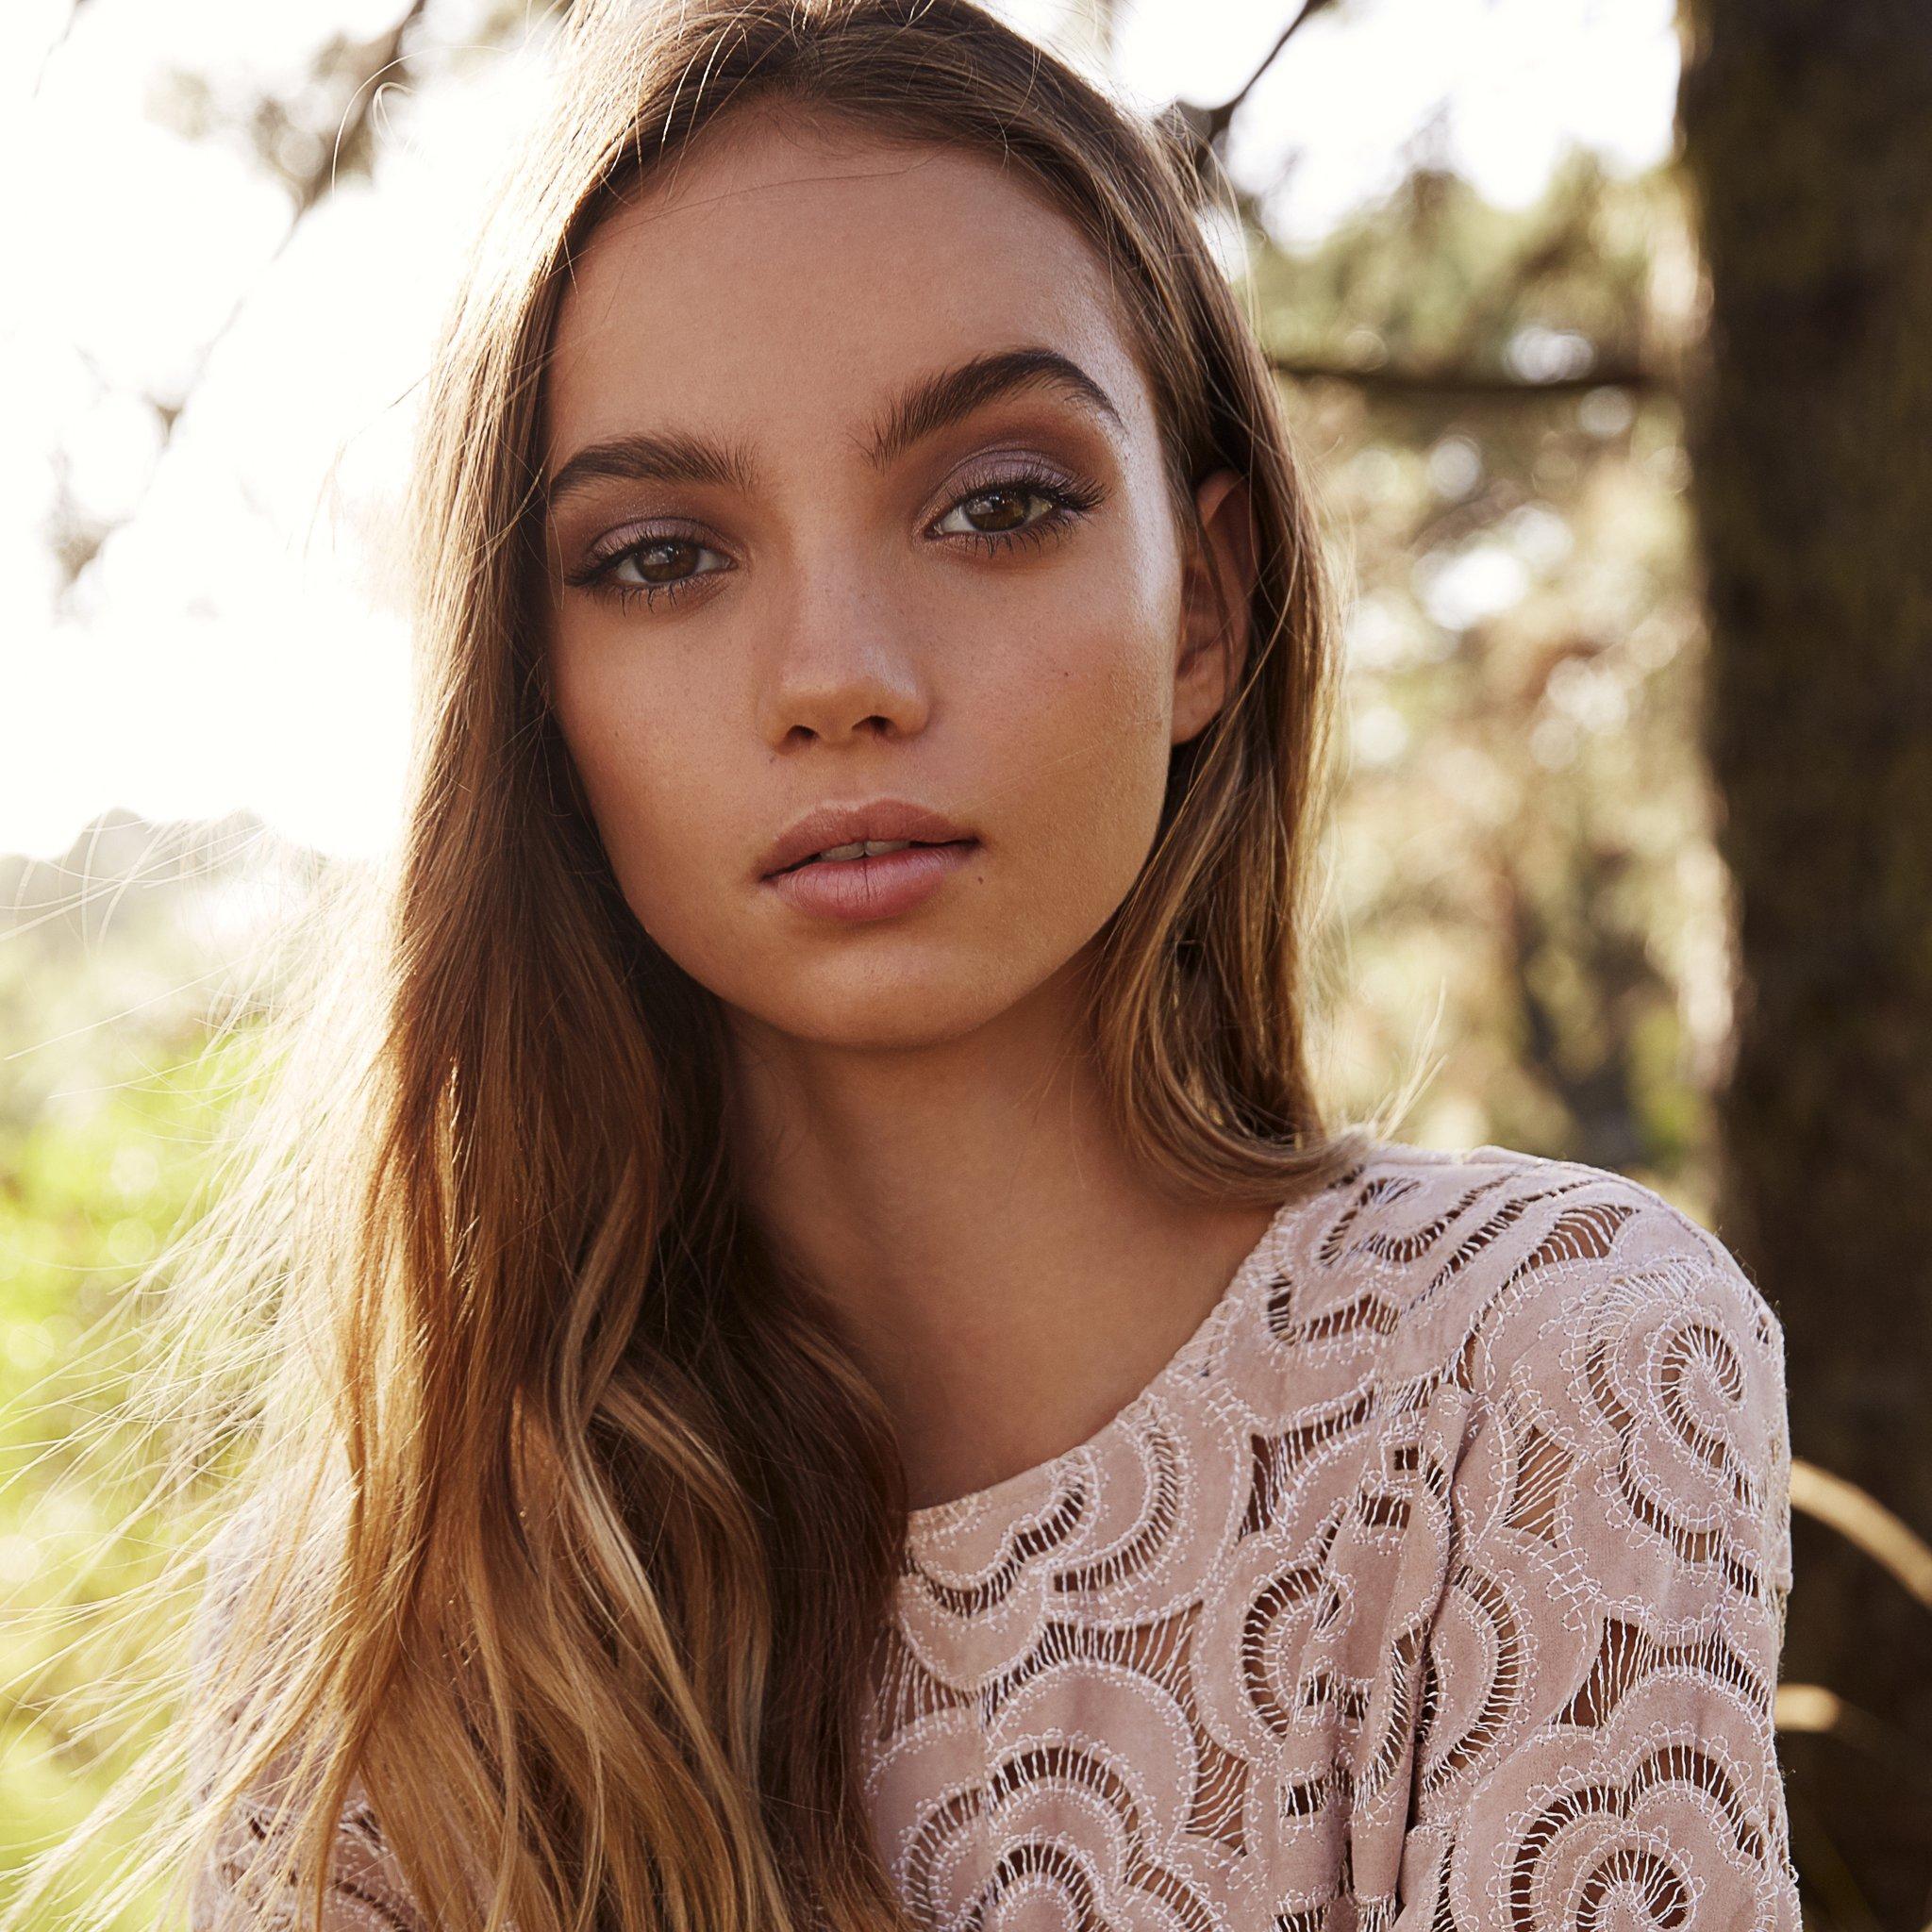 Aleksandra bortich nude in 039about love039 on scandalplanetcom - 2 3